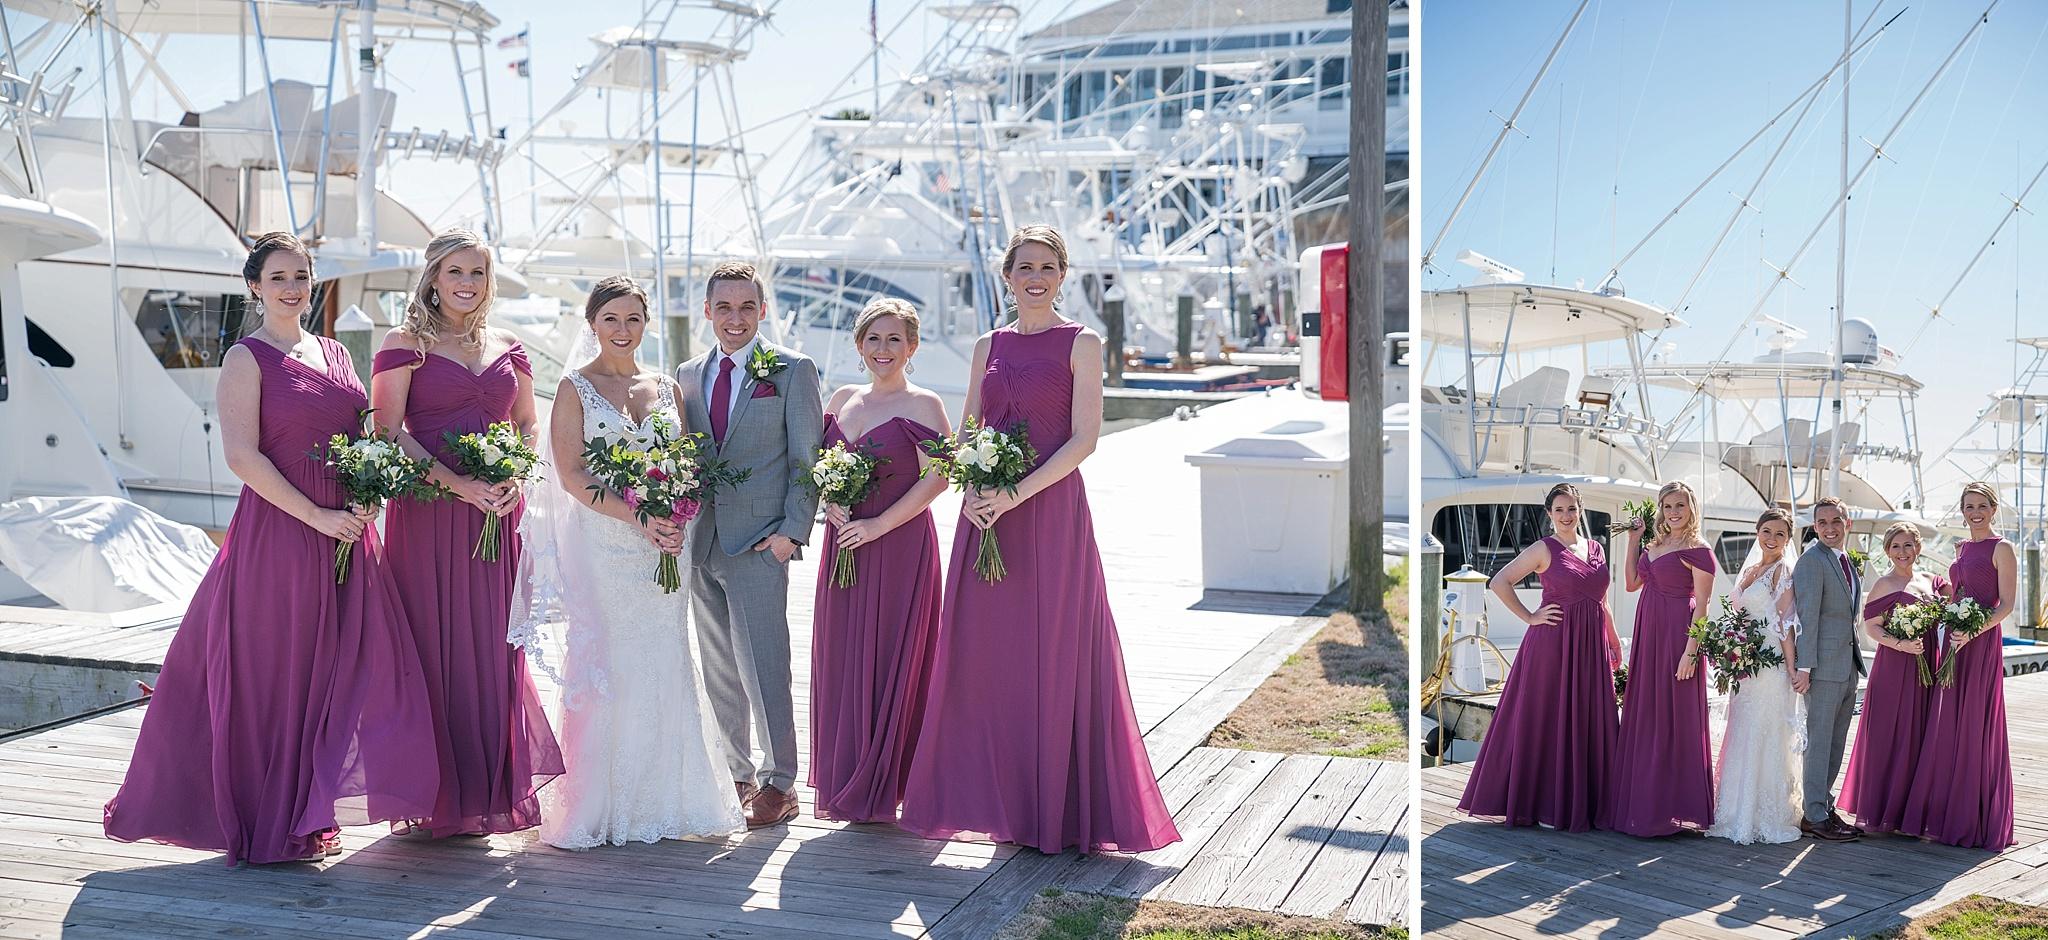 Manteo-NC-Wedding-Photographer-137.jpg